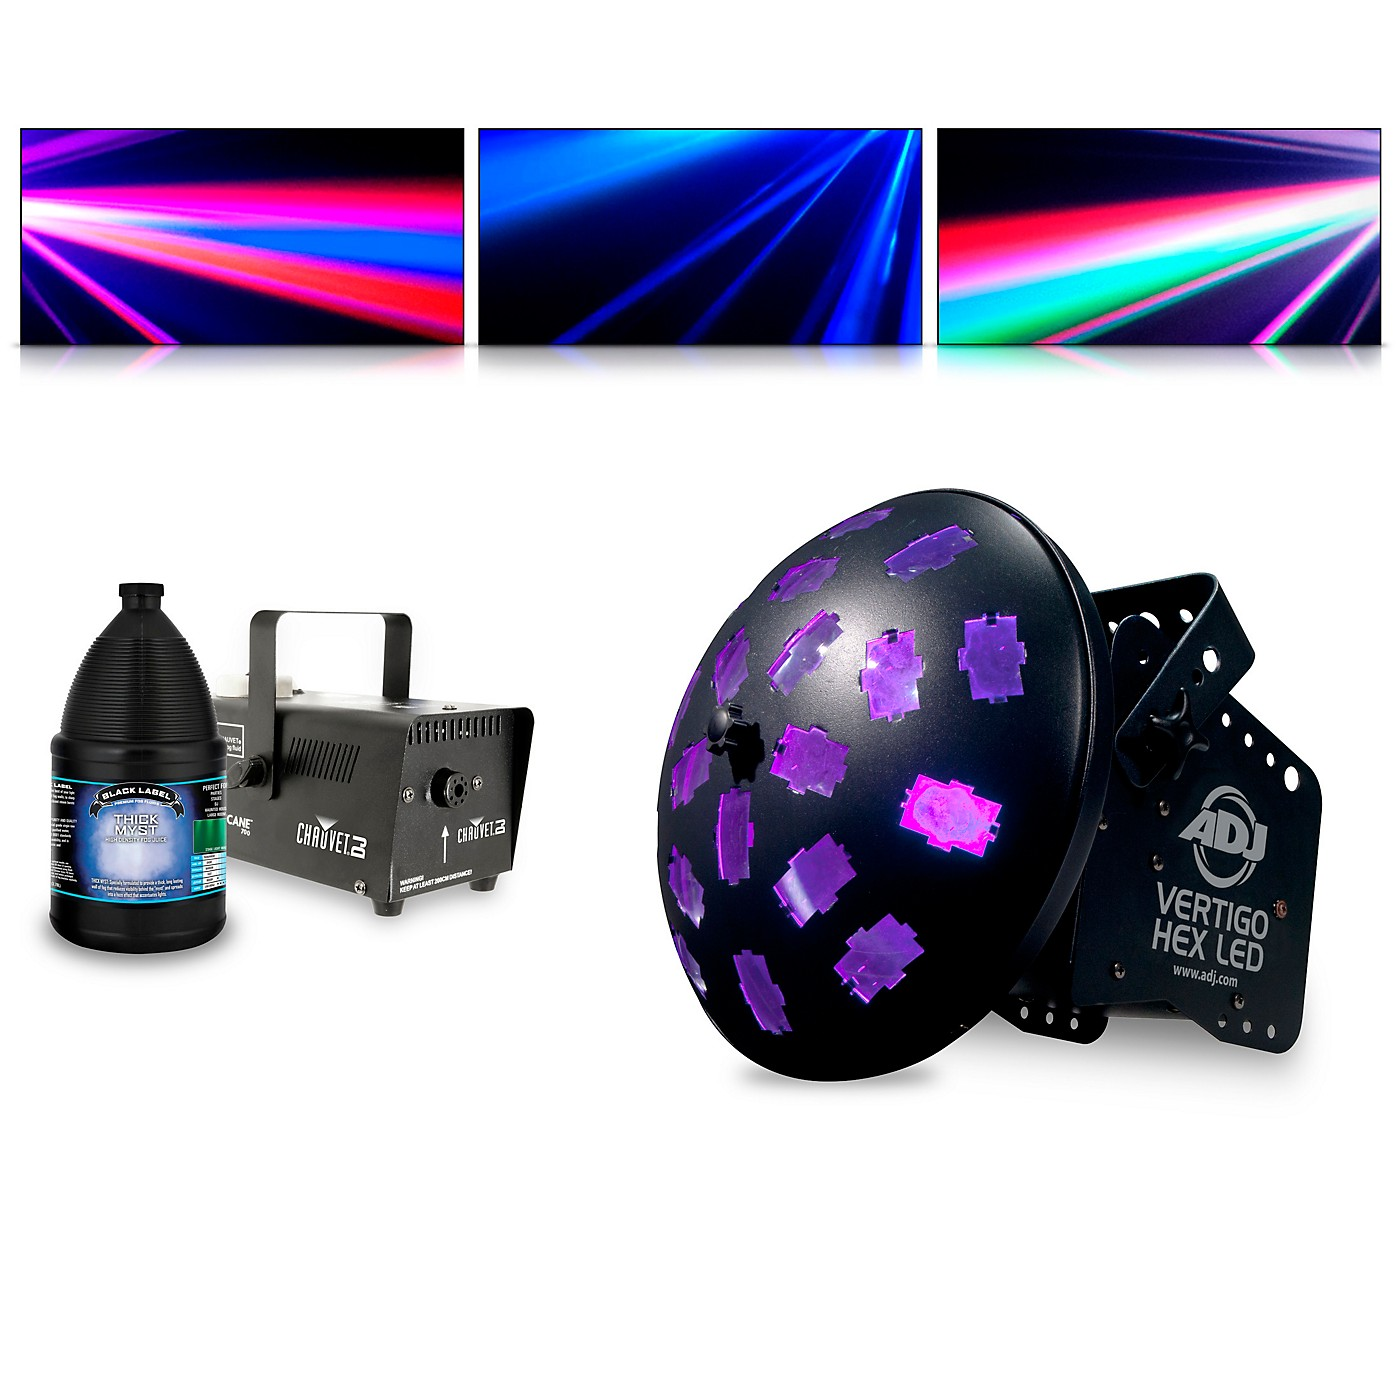 American DJ Vertigo Hex with Hurricane 700 Fog Machine and Juice thumbnail